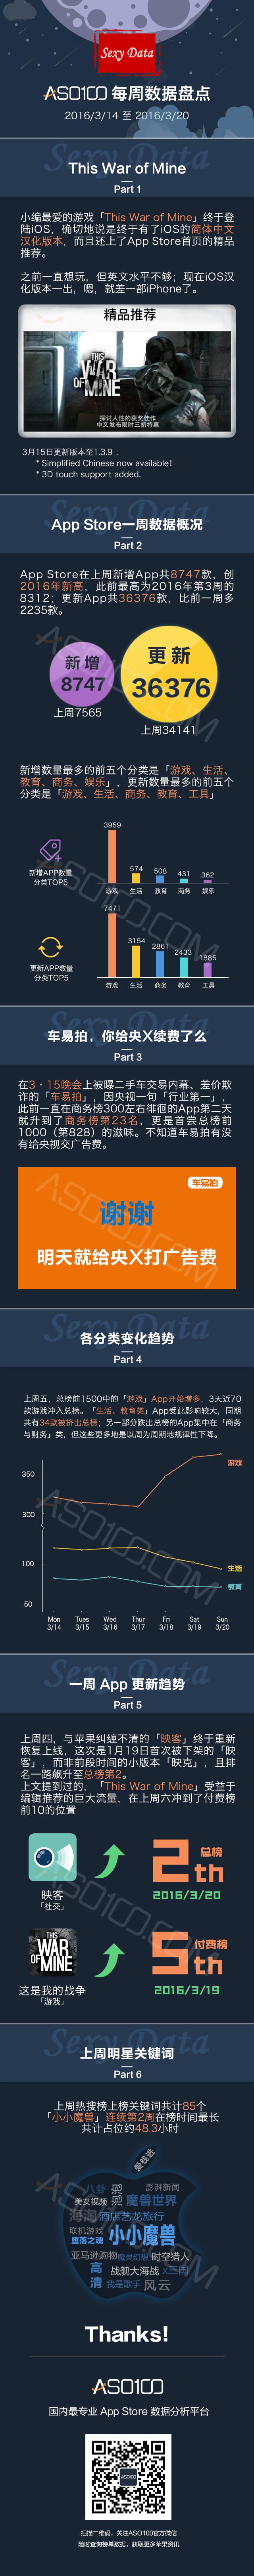 App Store 数据报告